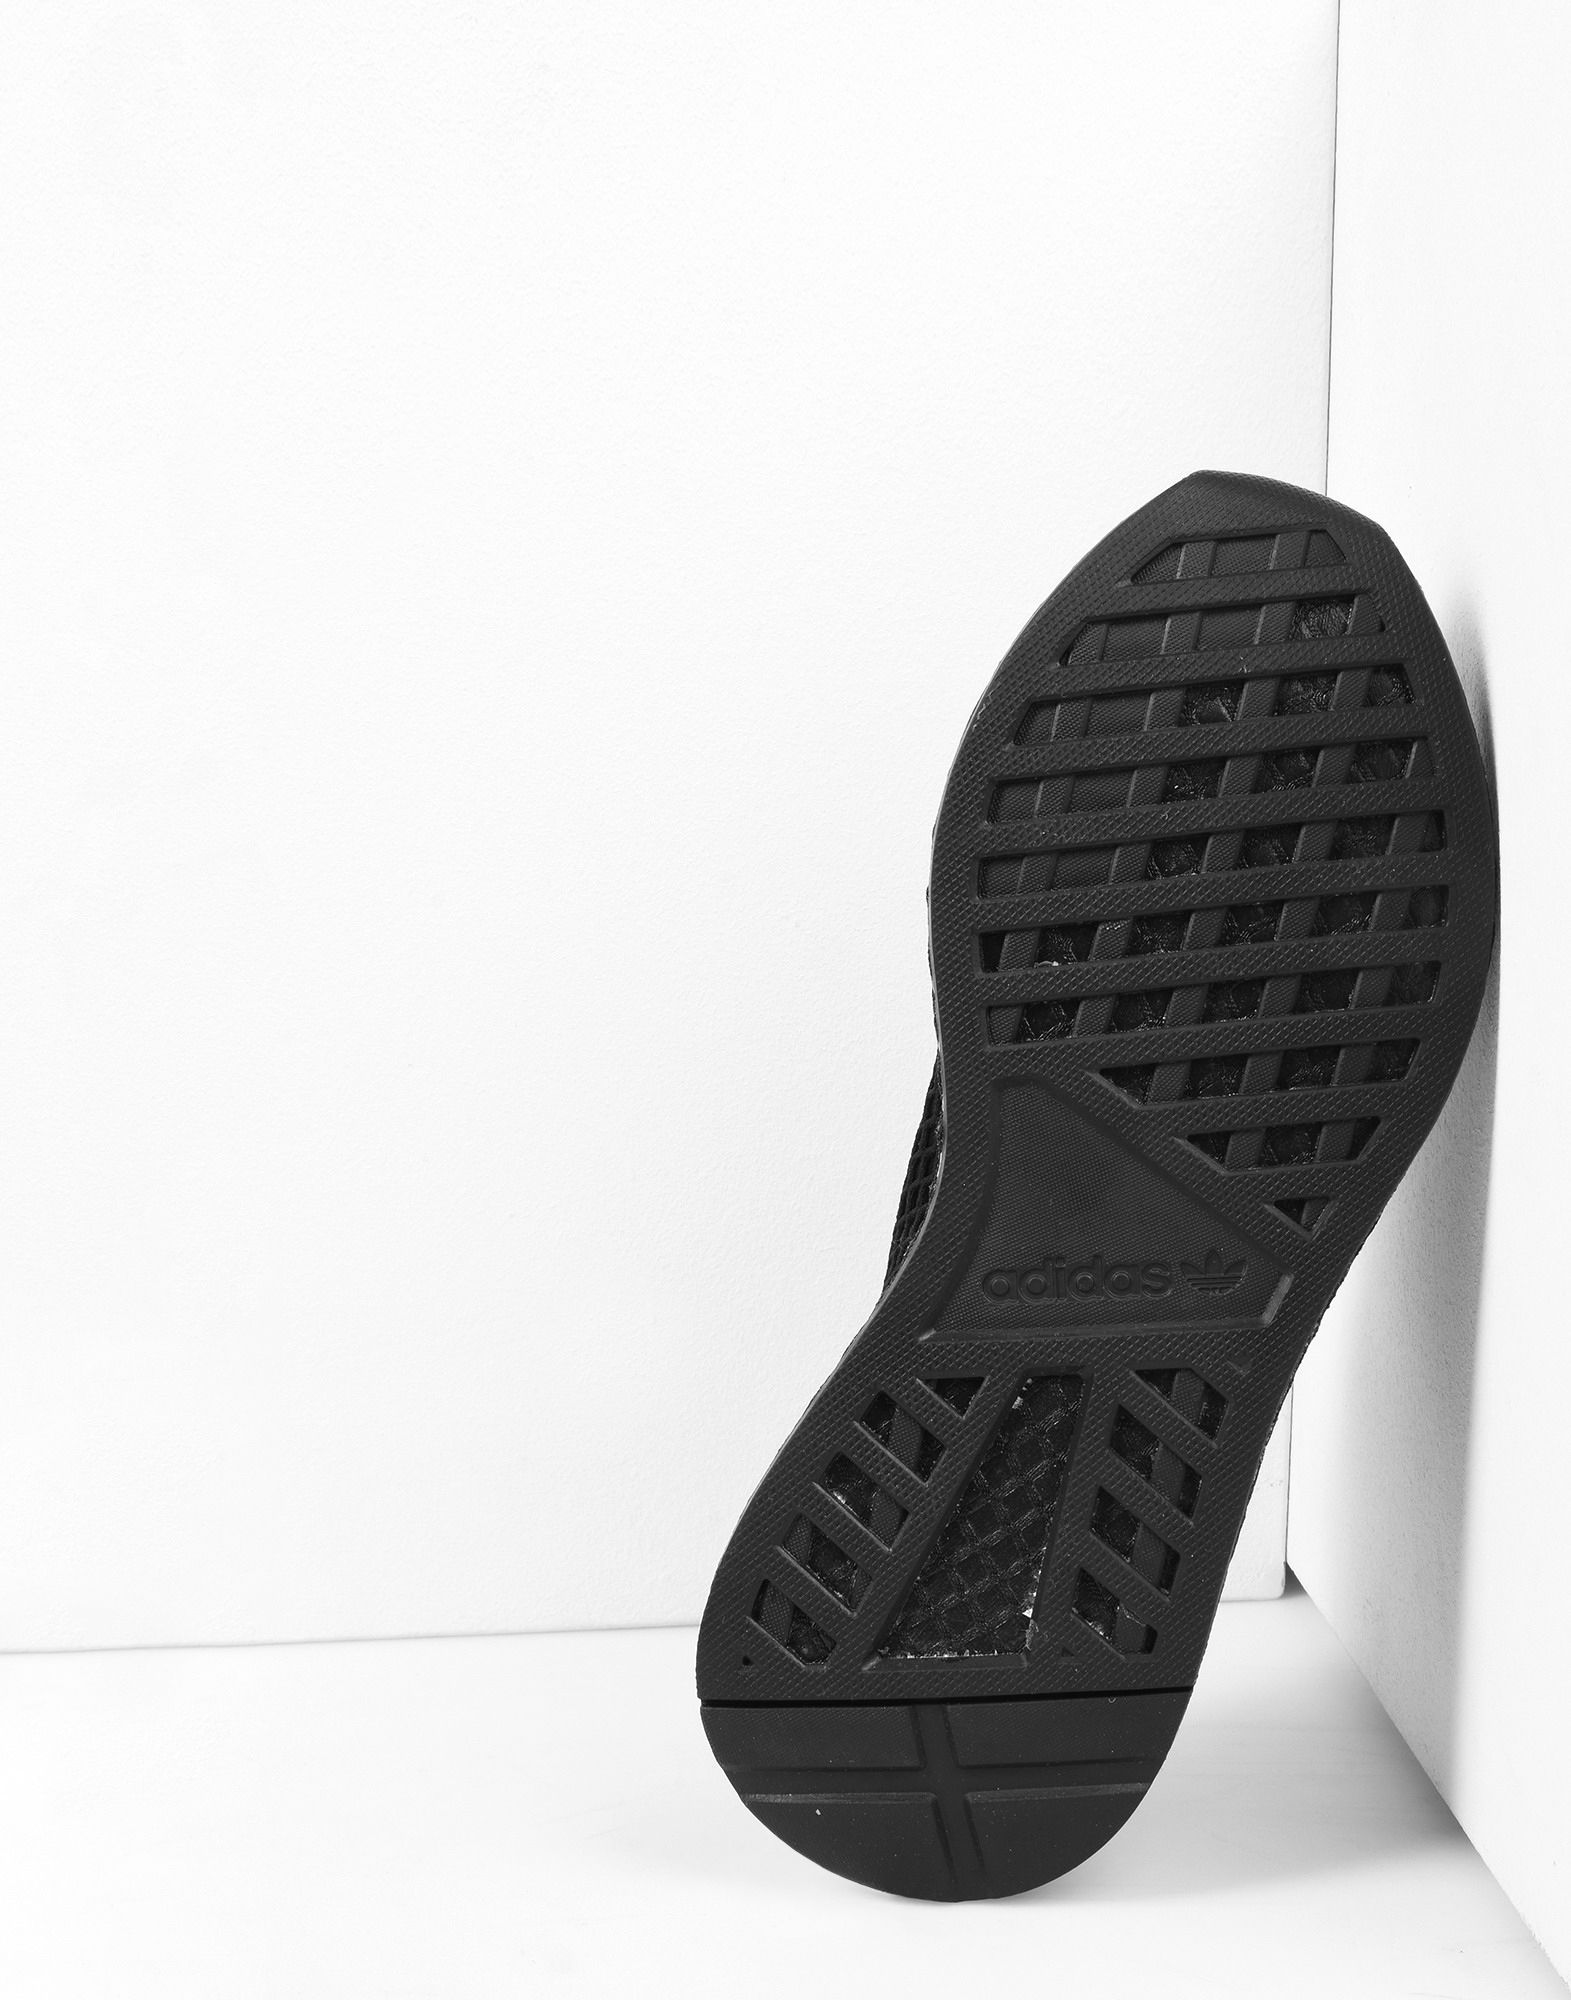 Adidas Originals Deerupt beliebte Runner  11540401FJ Gute Qualität beliebte Deerupt Schuhe 84bf3c